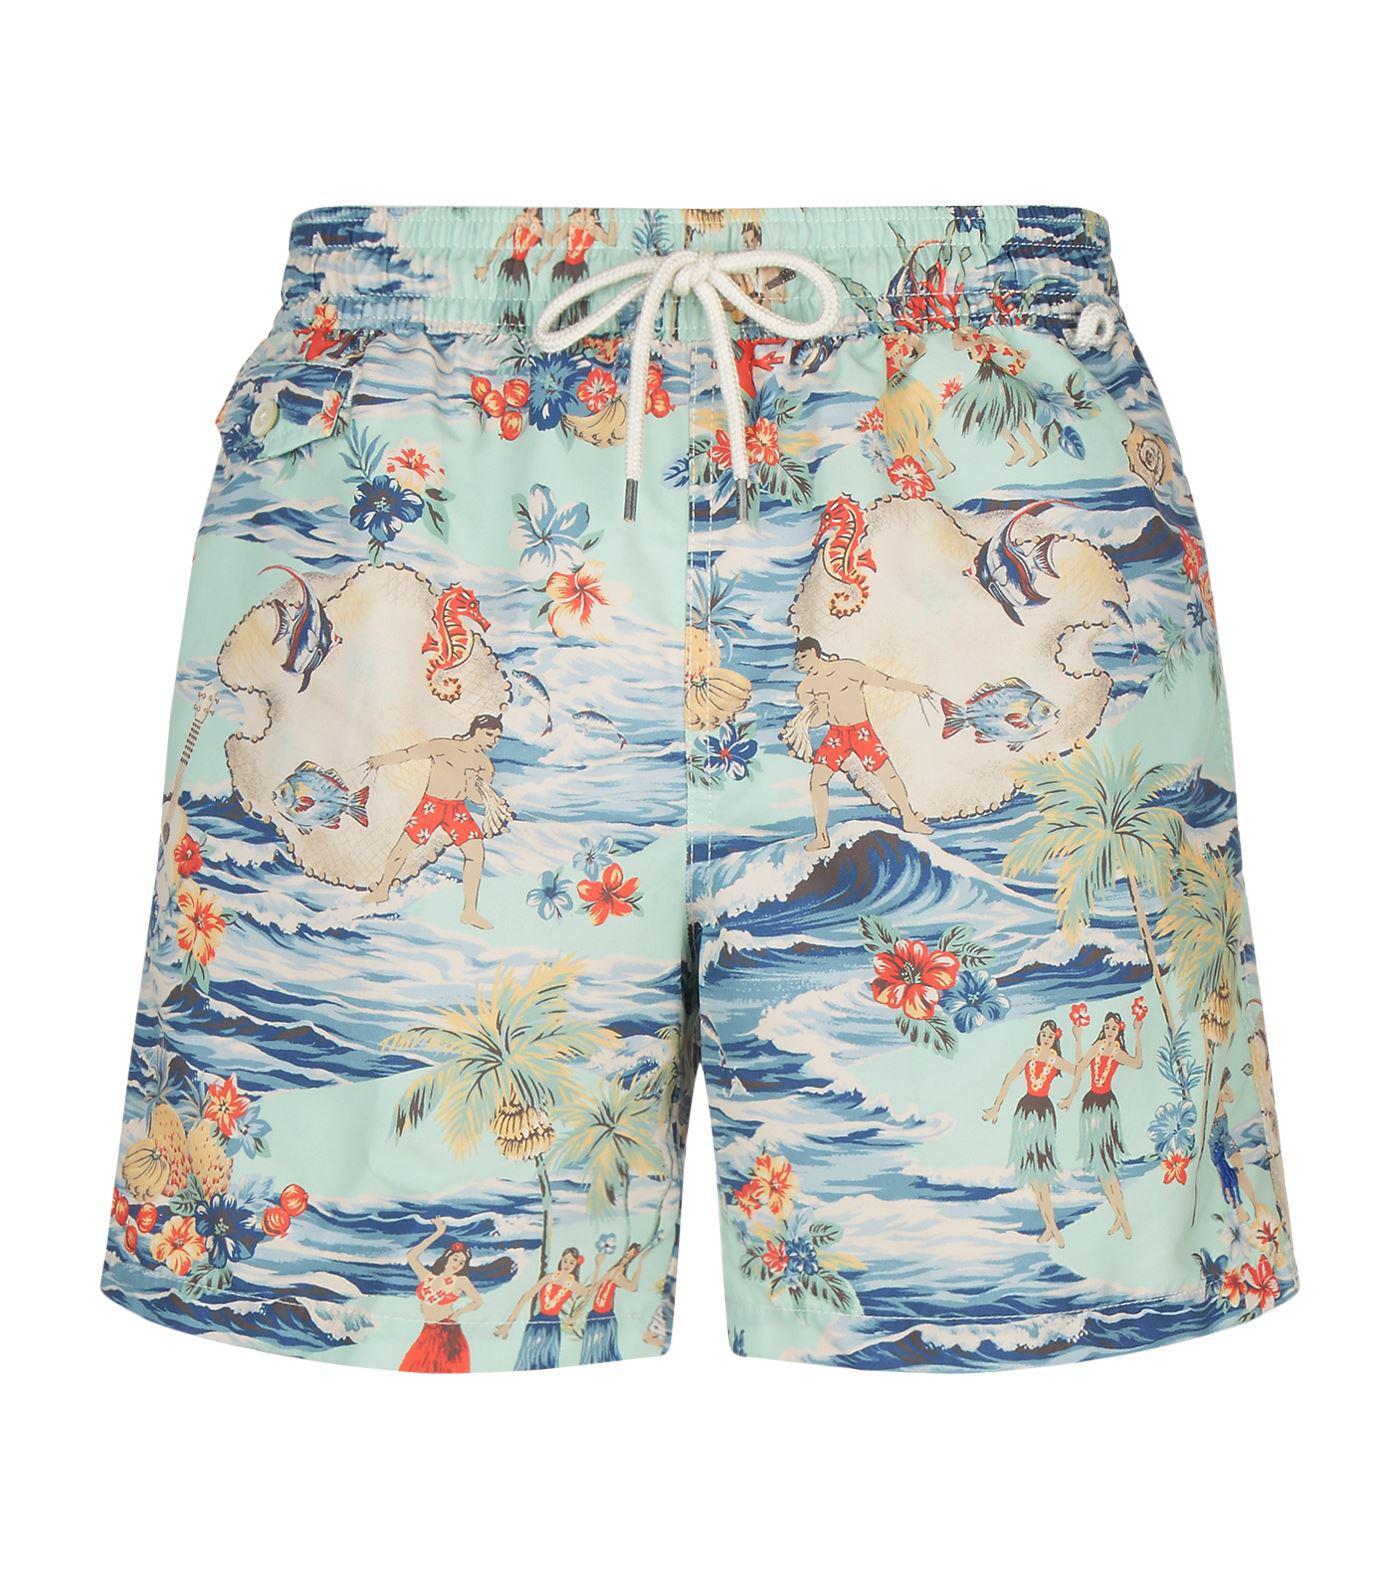 c5988c65fb Lyst - Polo Ralph Lauren Printed Swim Shorts in Blue for Men